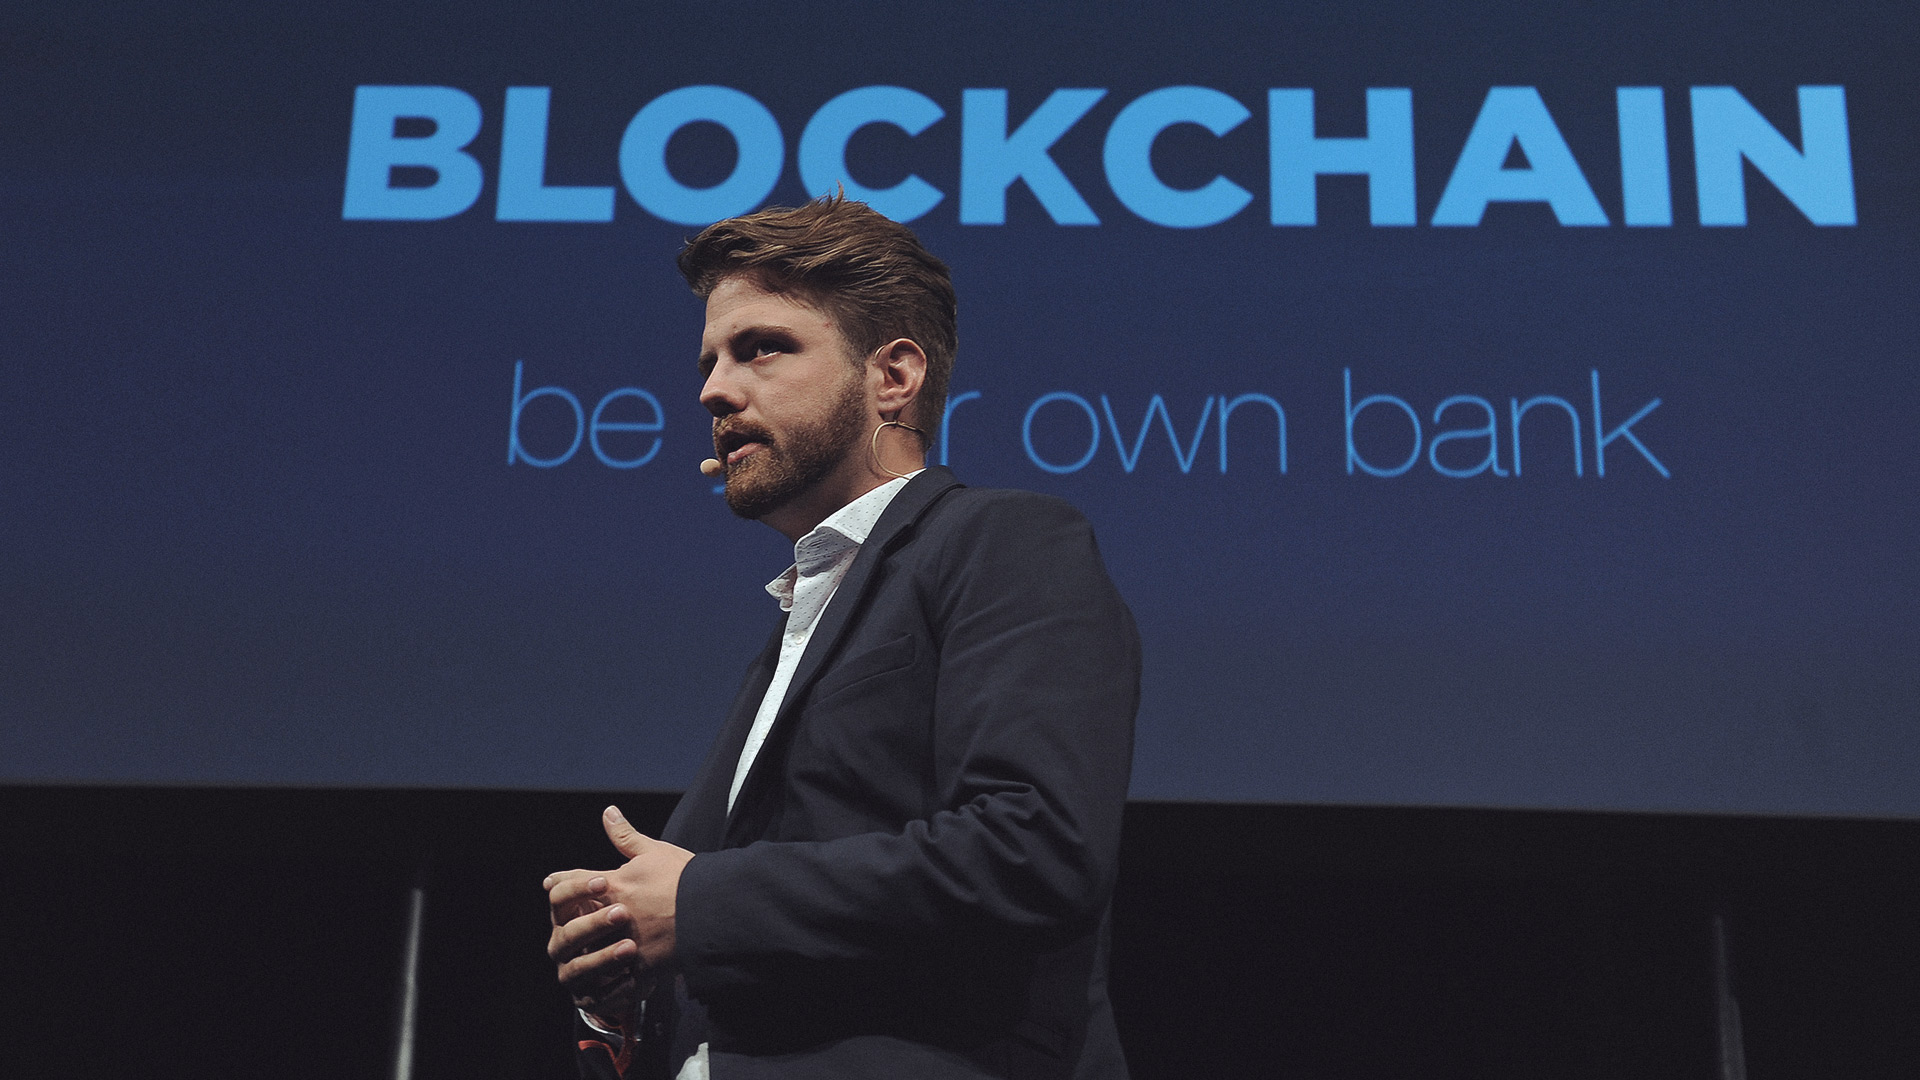 Blockchain.com CEO: London's reign as fintech capital is 'definitely over'